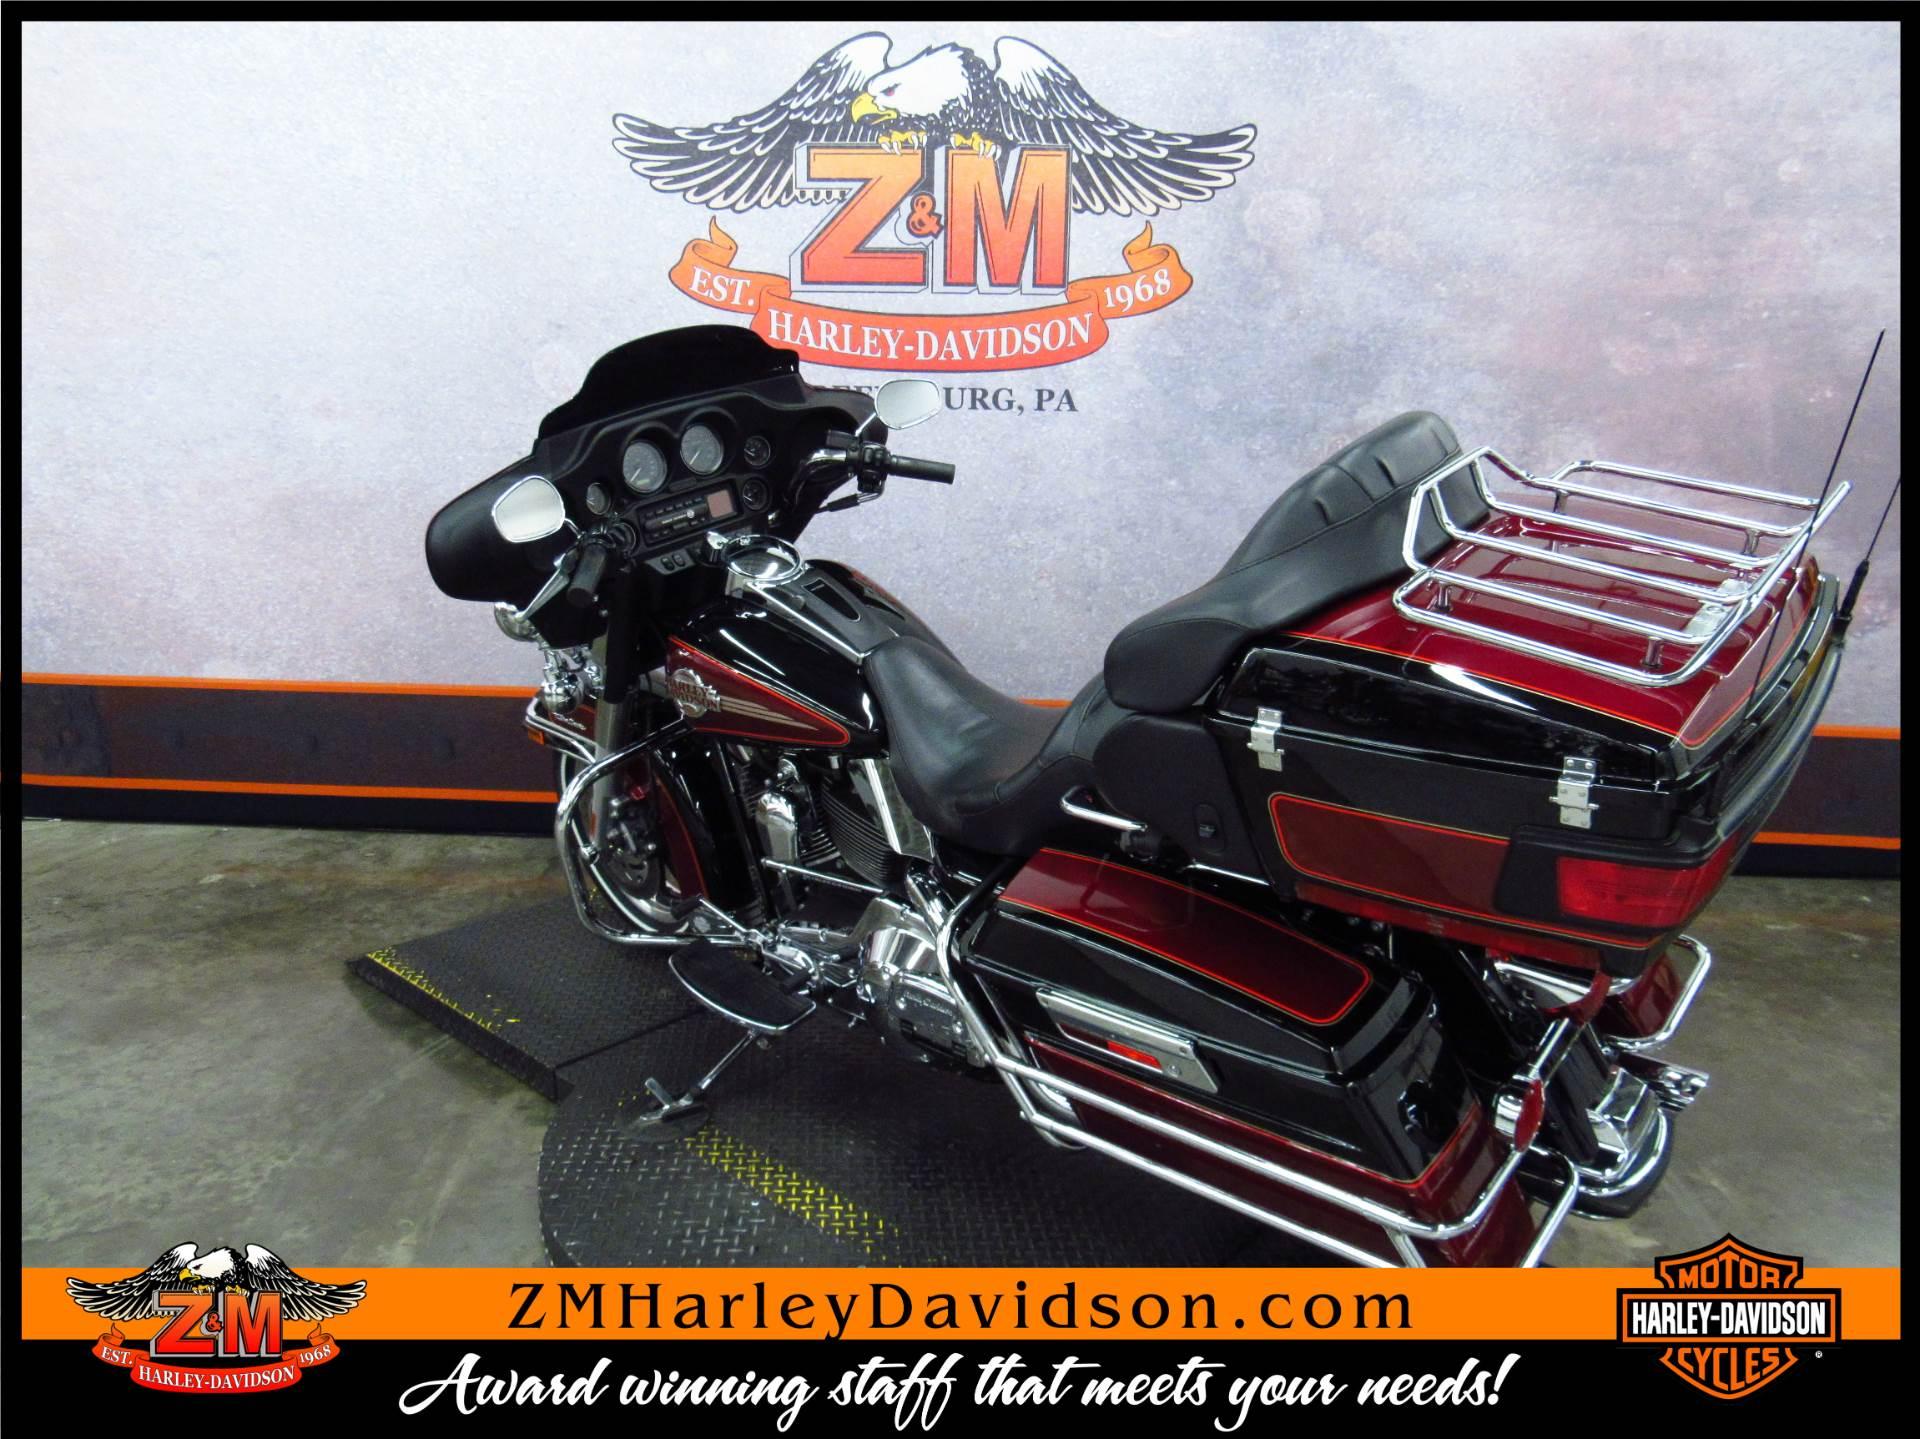 2005 Harley-Davidson FLHTCUI Ultra Classic Electra Glide 6